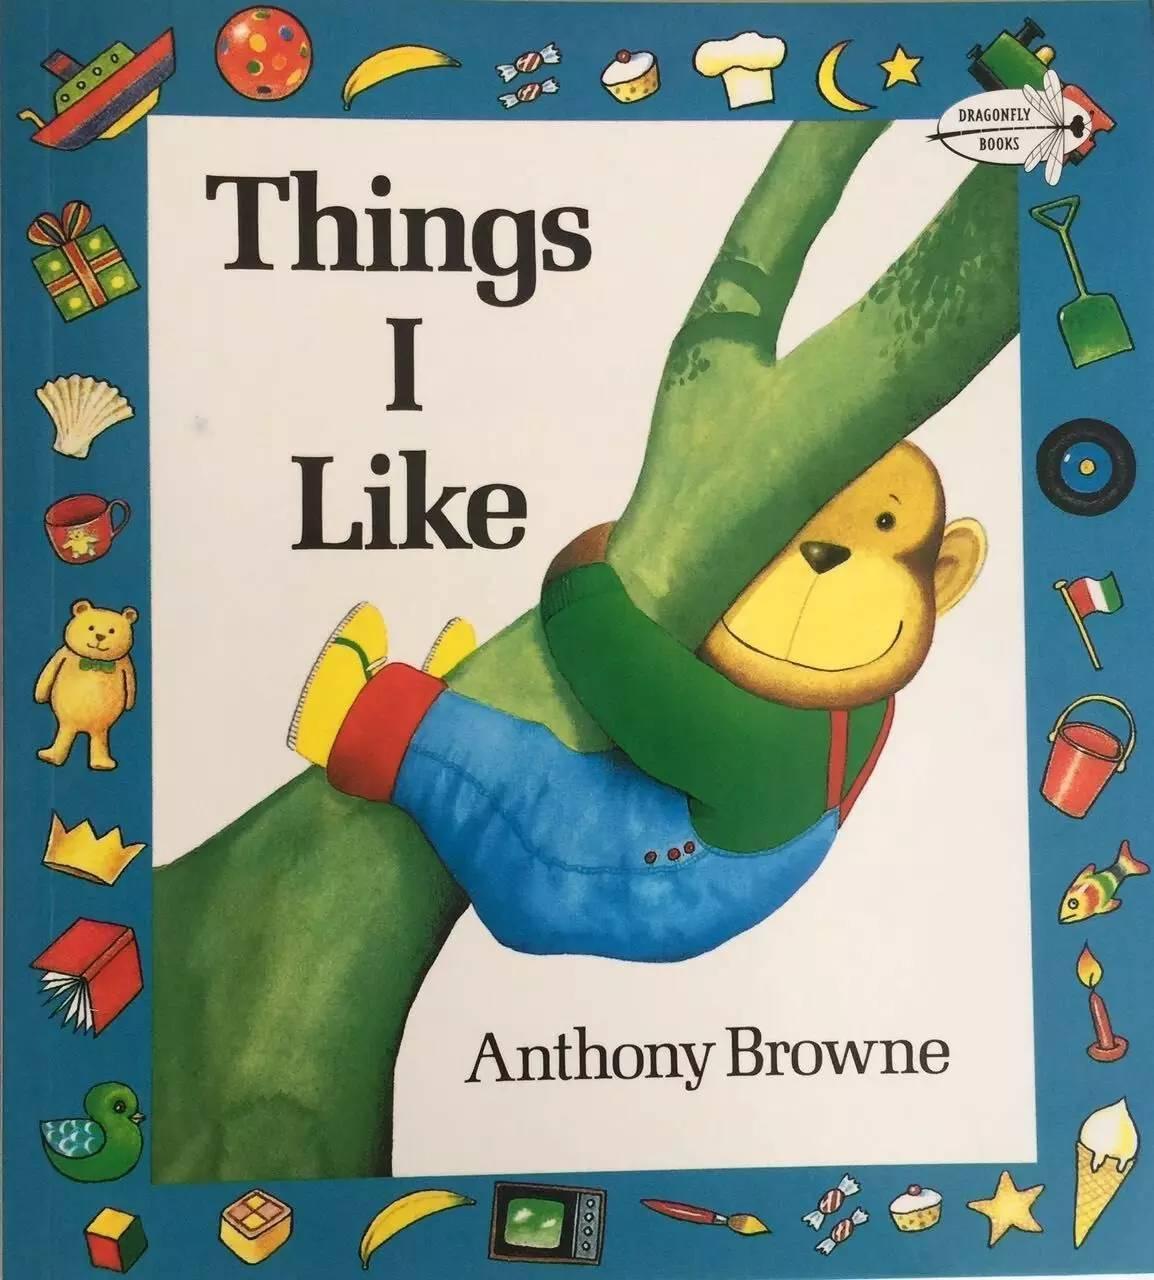 Things I Like 我喜欢的一切 -第1张图片-58绘本网-专注儿童绘本批发销售。